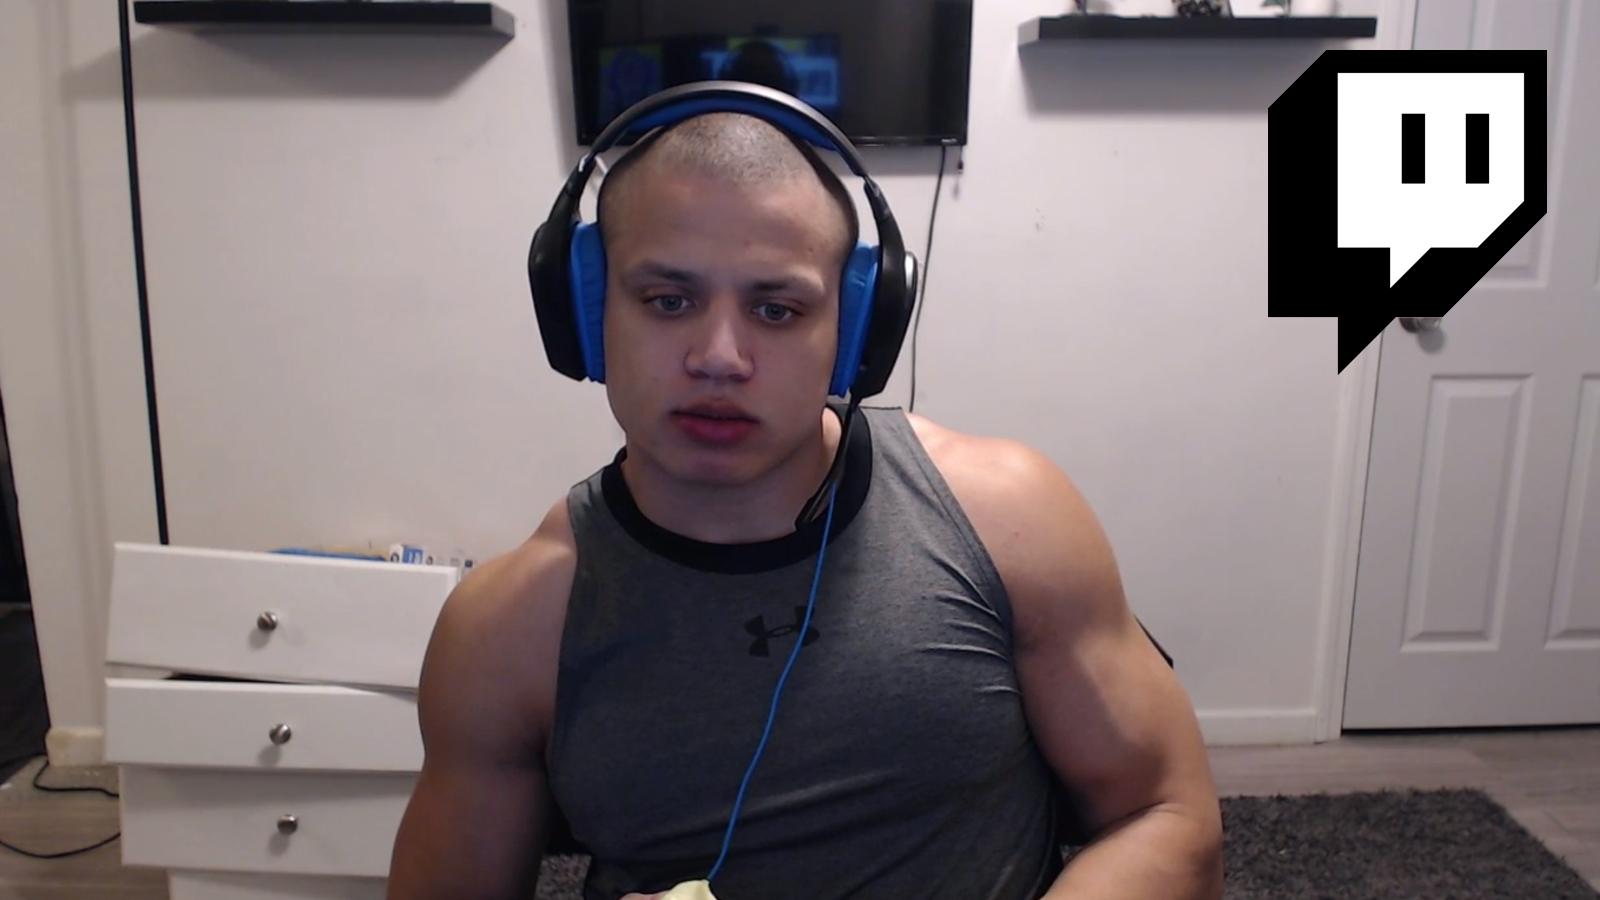 Tyler1 Twitch donation cap